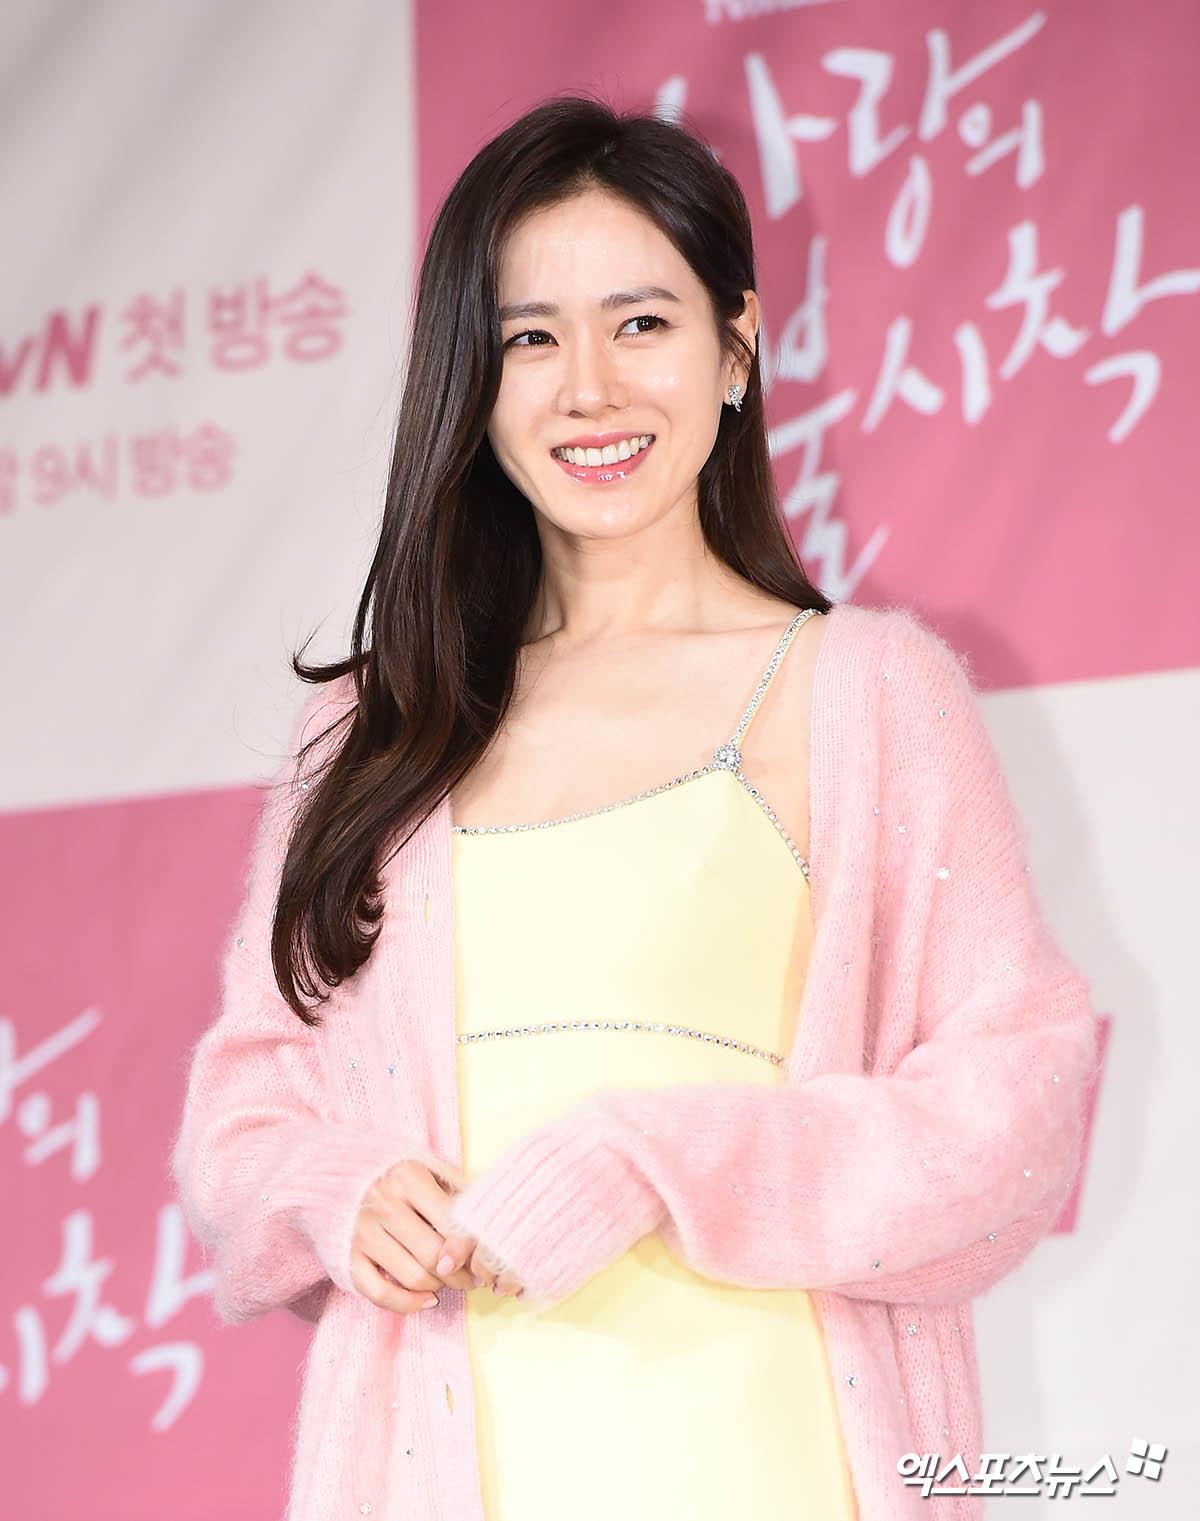 [N년 전 오늘의 XP] 현빈-손예진, 완벽한 케미 빛났던 드라마 '사랑의 불시착' 제작발표회